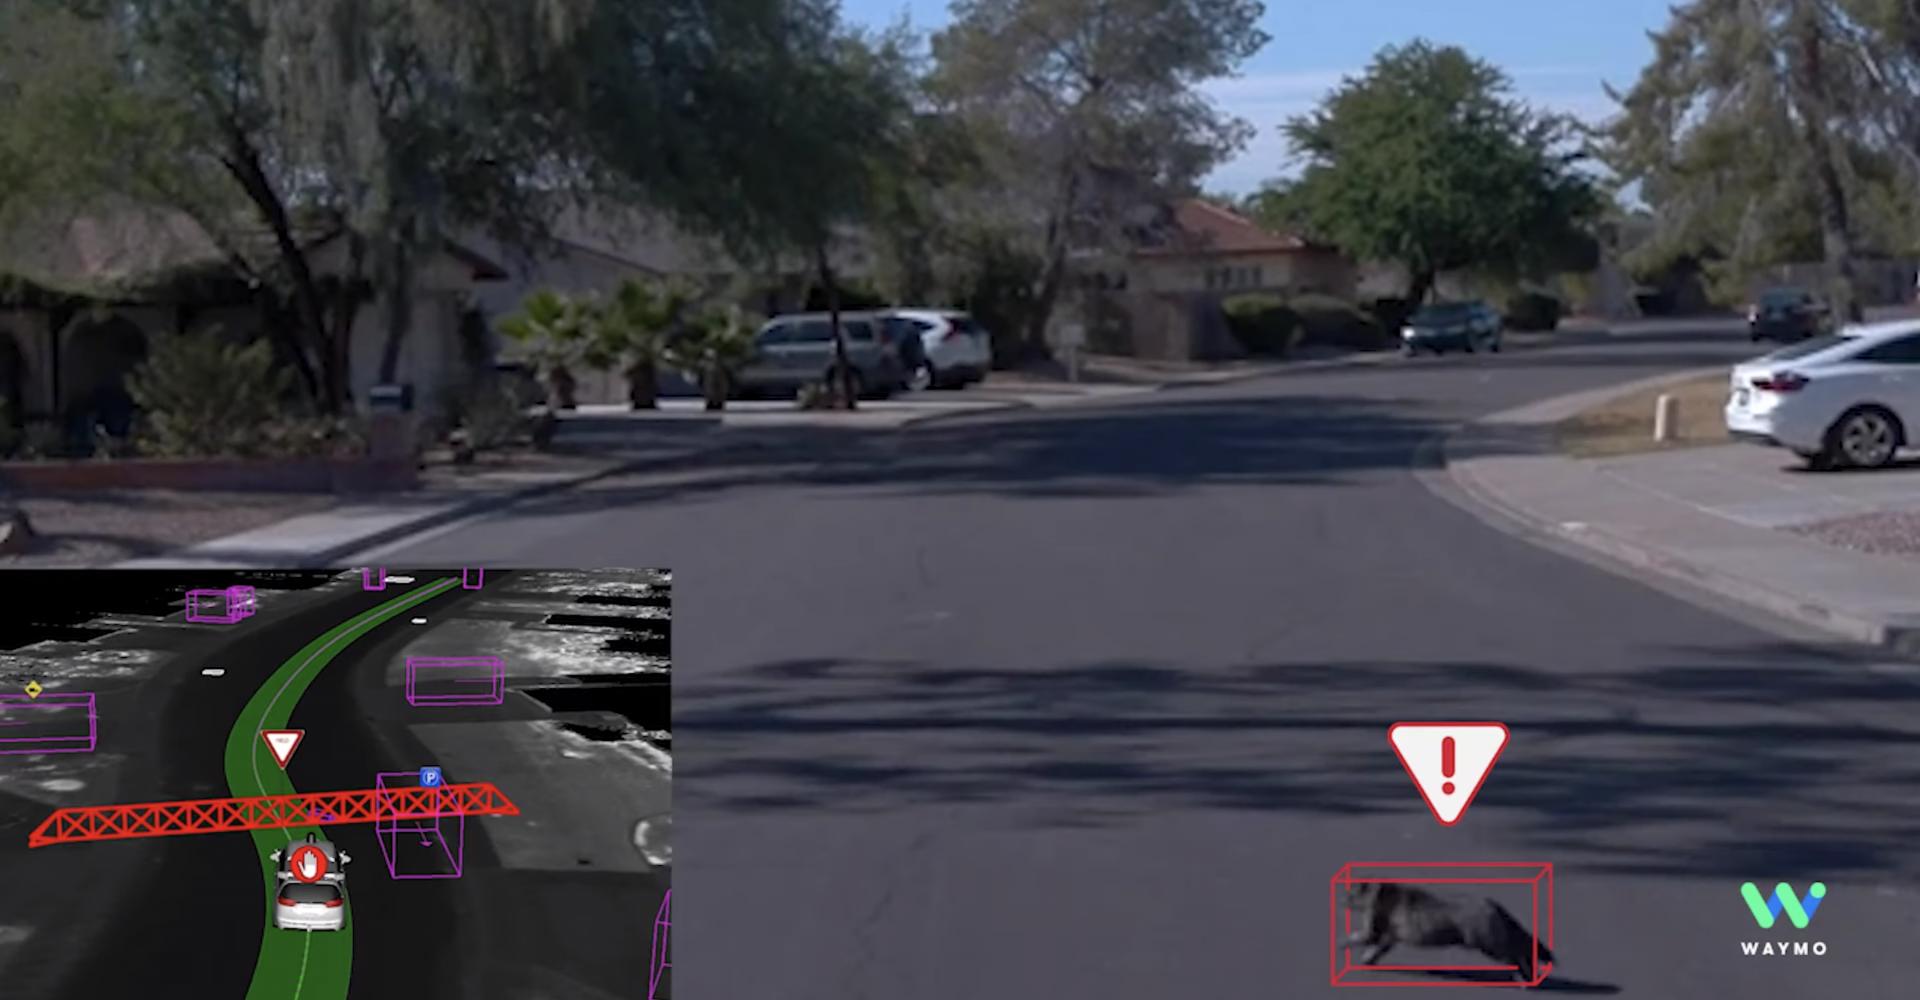 Waymo shows how its autonomous car dodged a cat